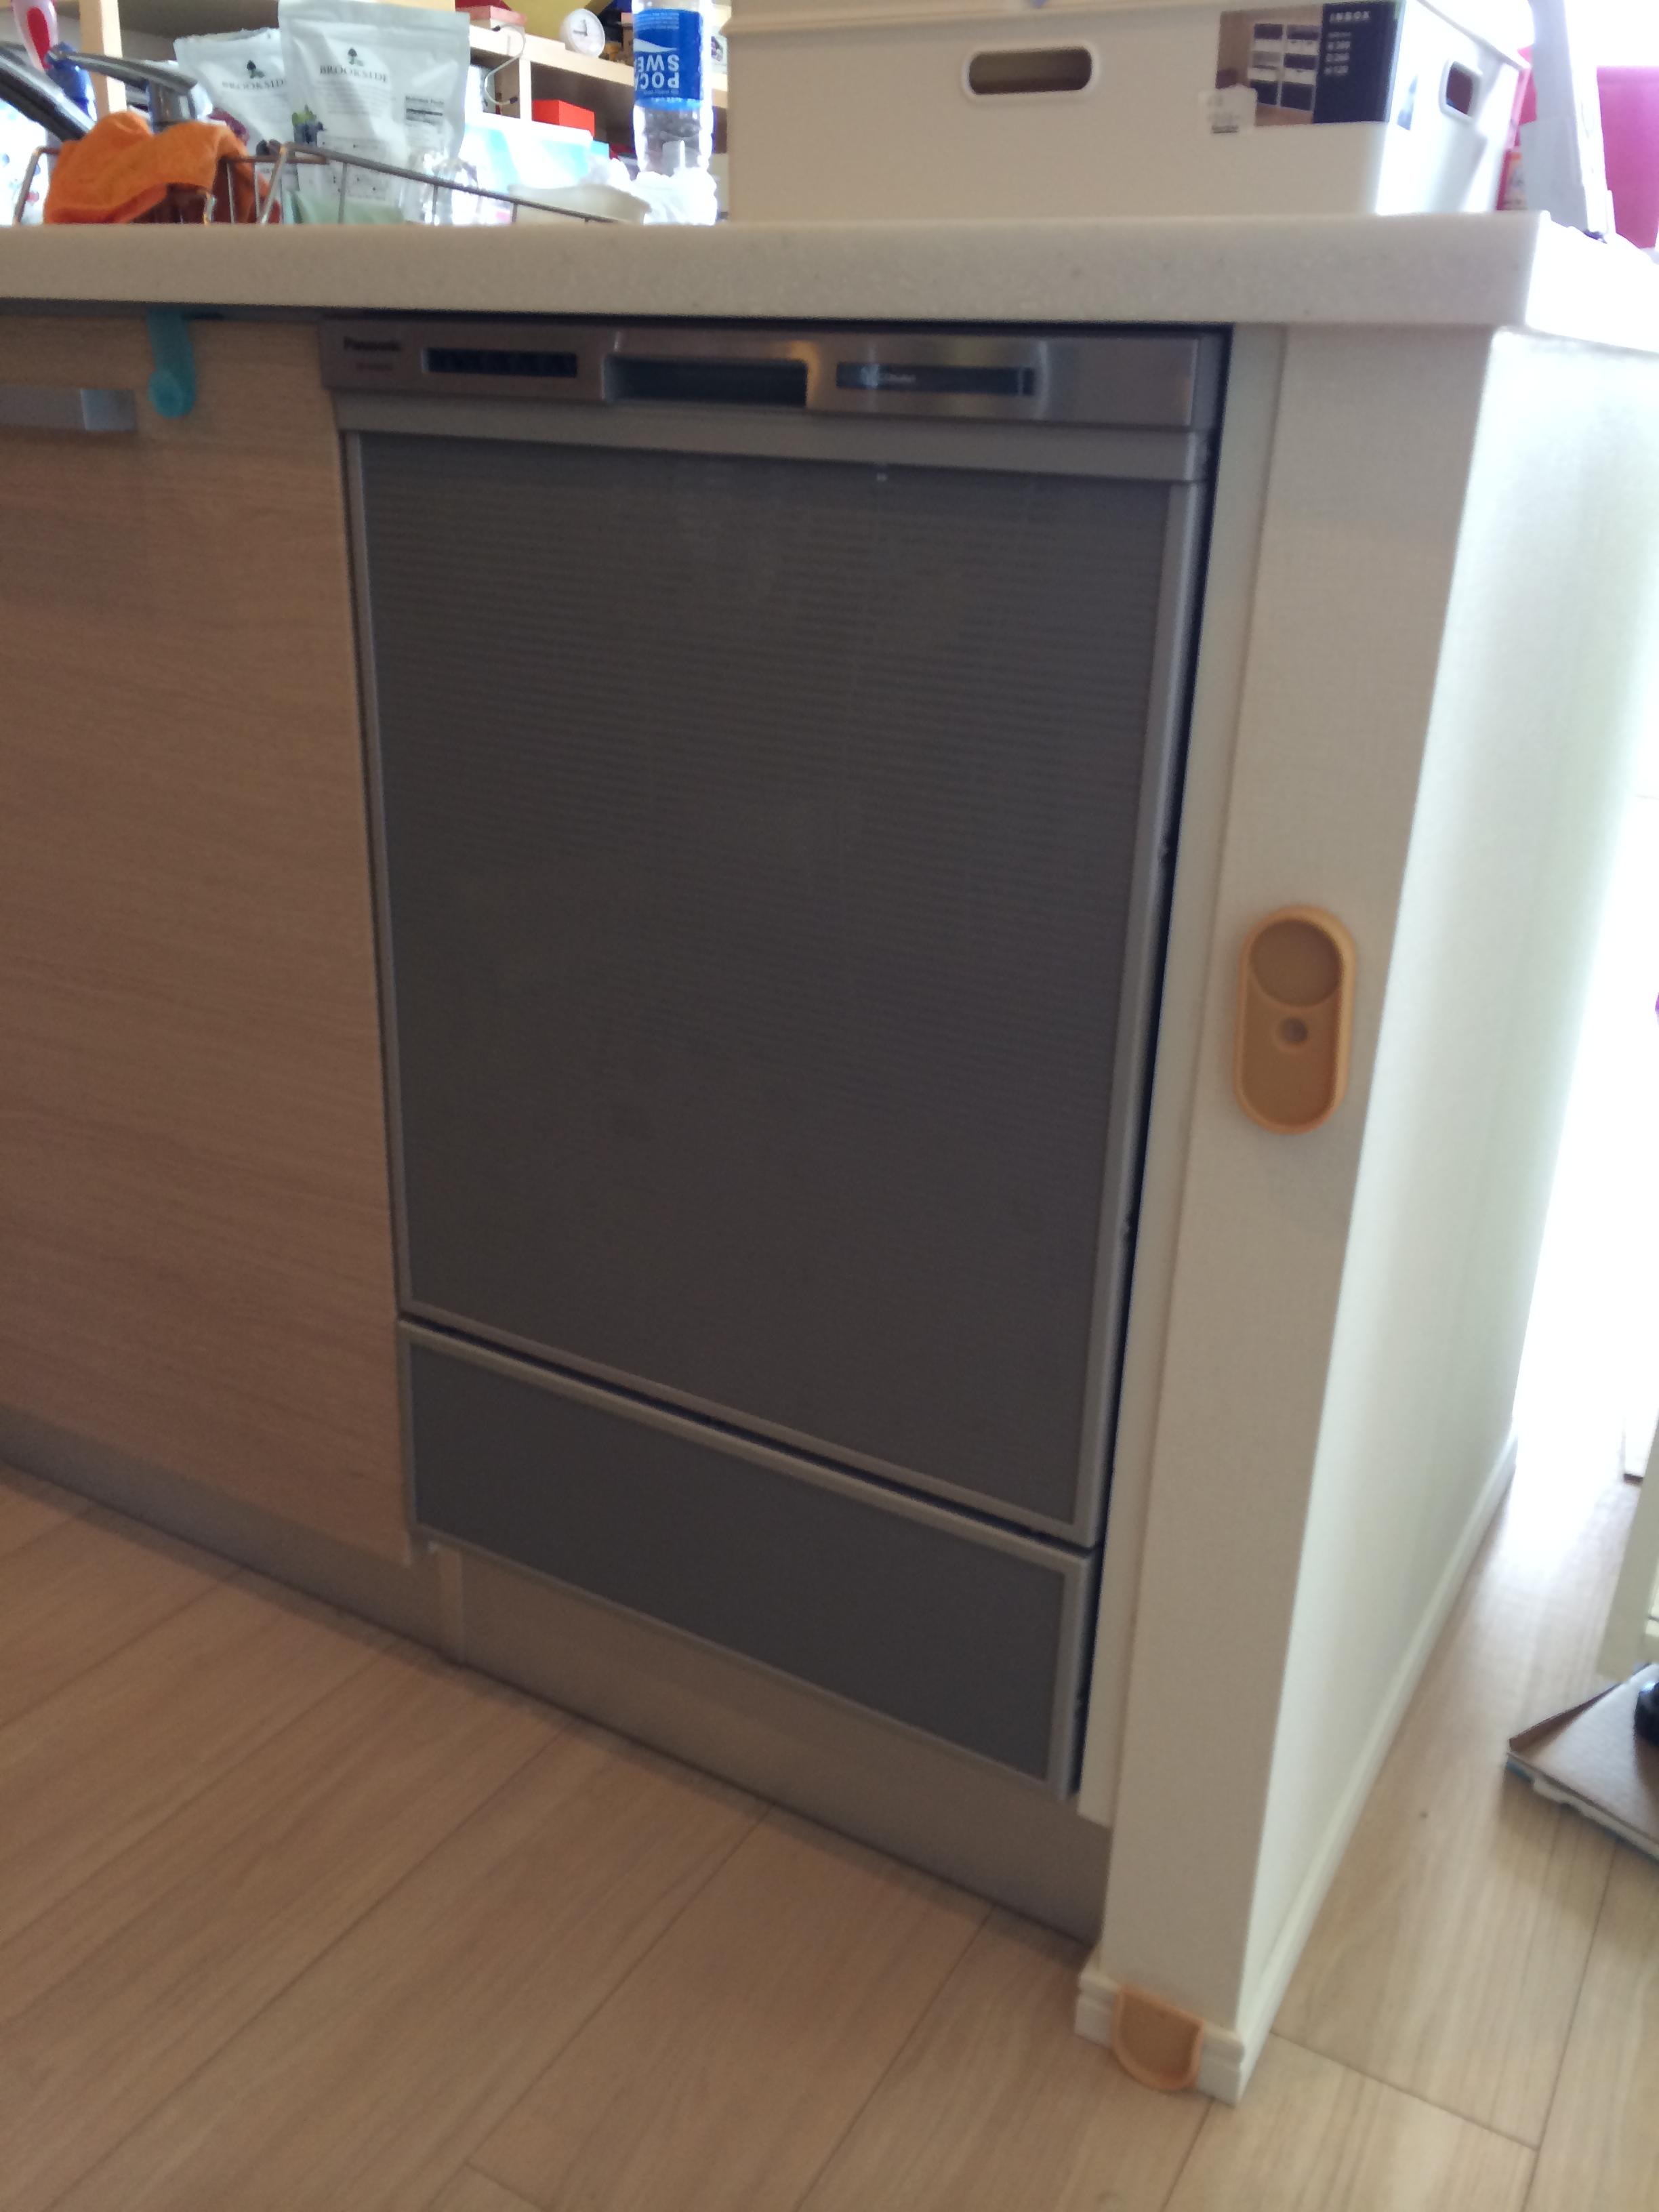 Panasonic 食器洗乾燥機 NP-45MD6S 設置工事